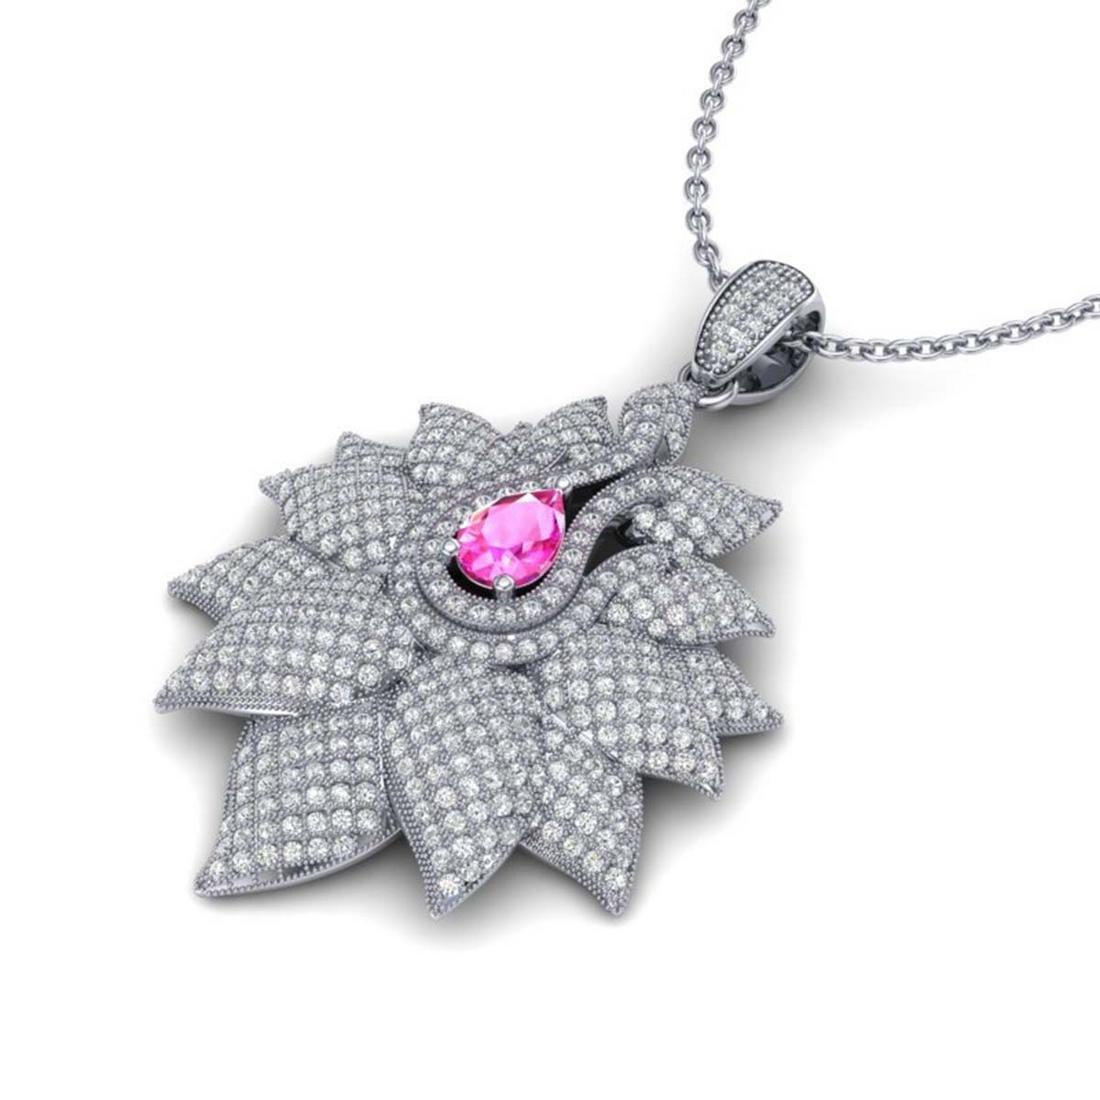 3 ctw Pink Sapphire & VS/SI Diamond Necklace 18K White